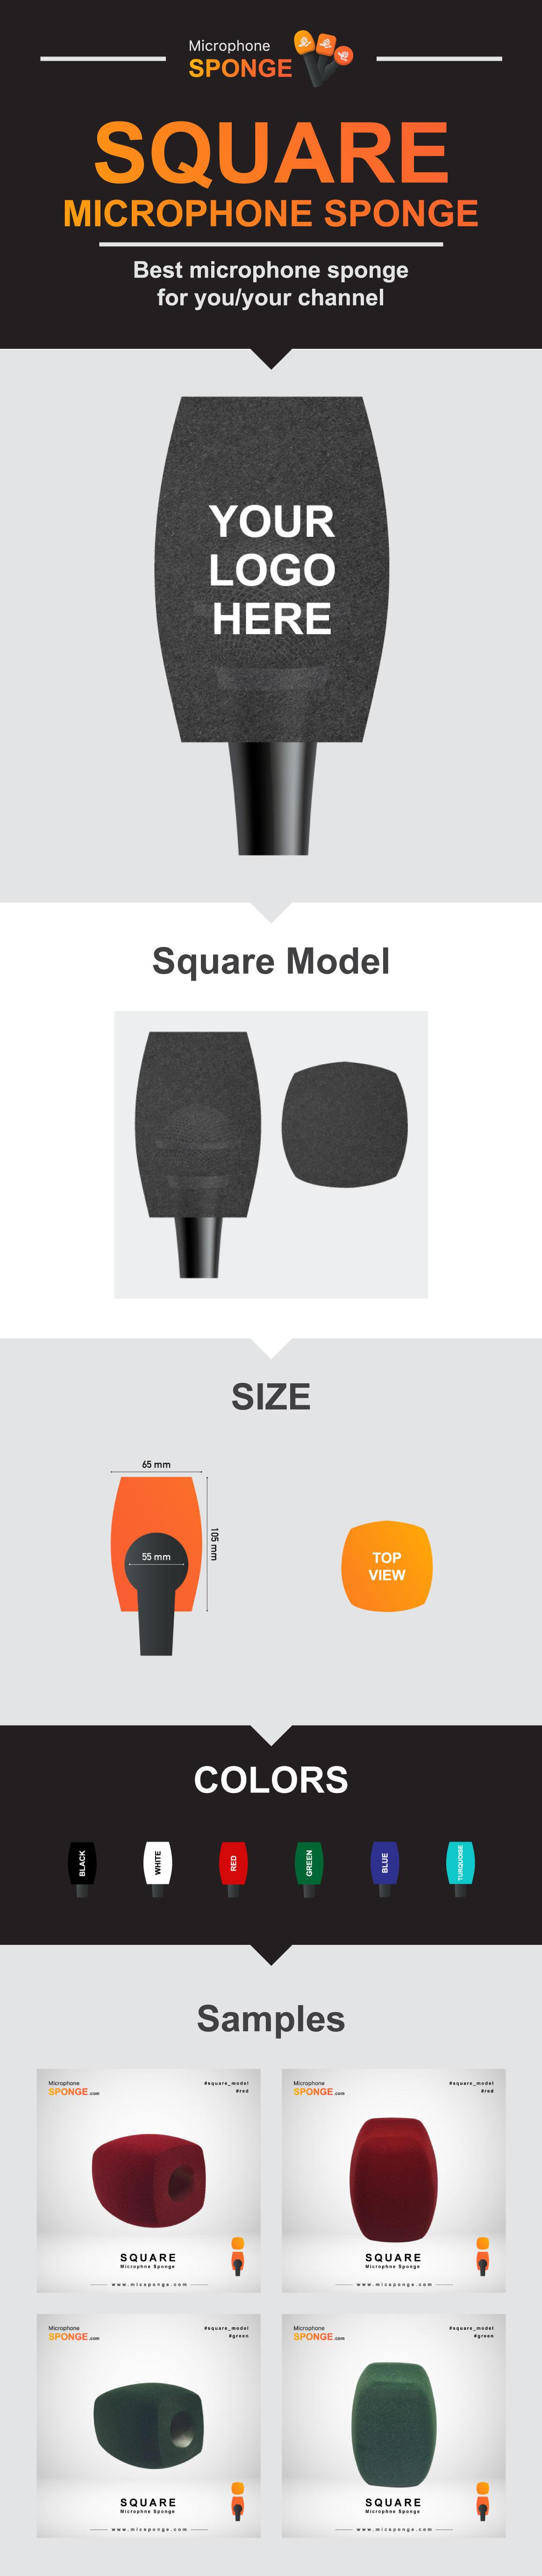 Microphone Sponge Square